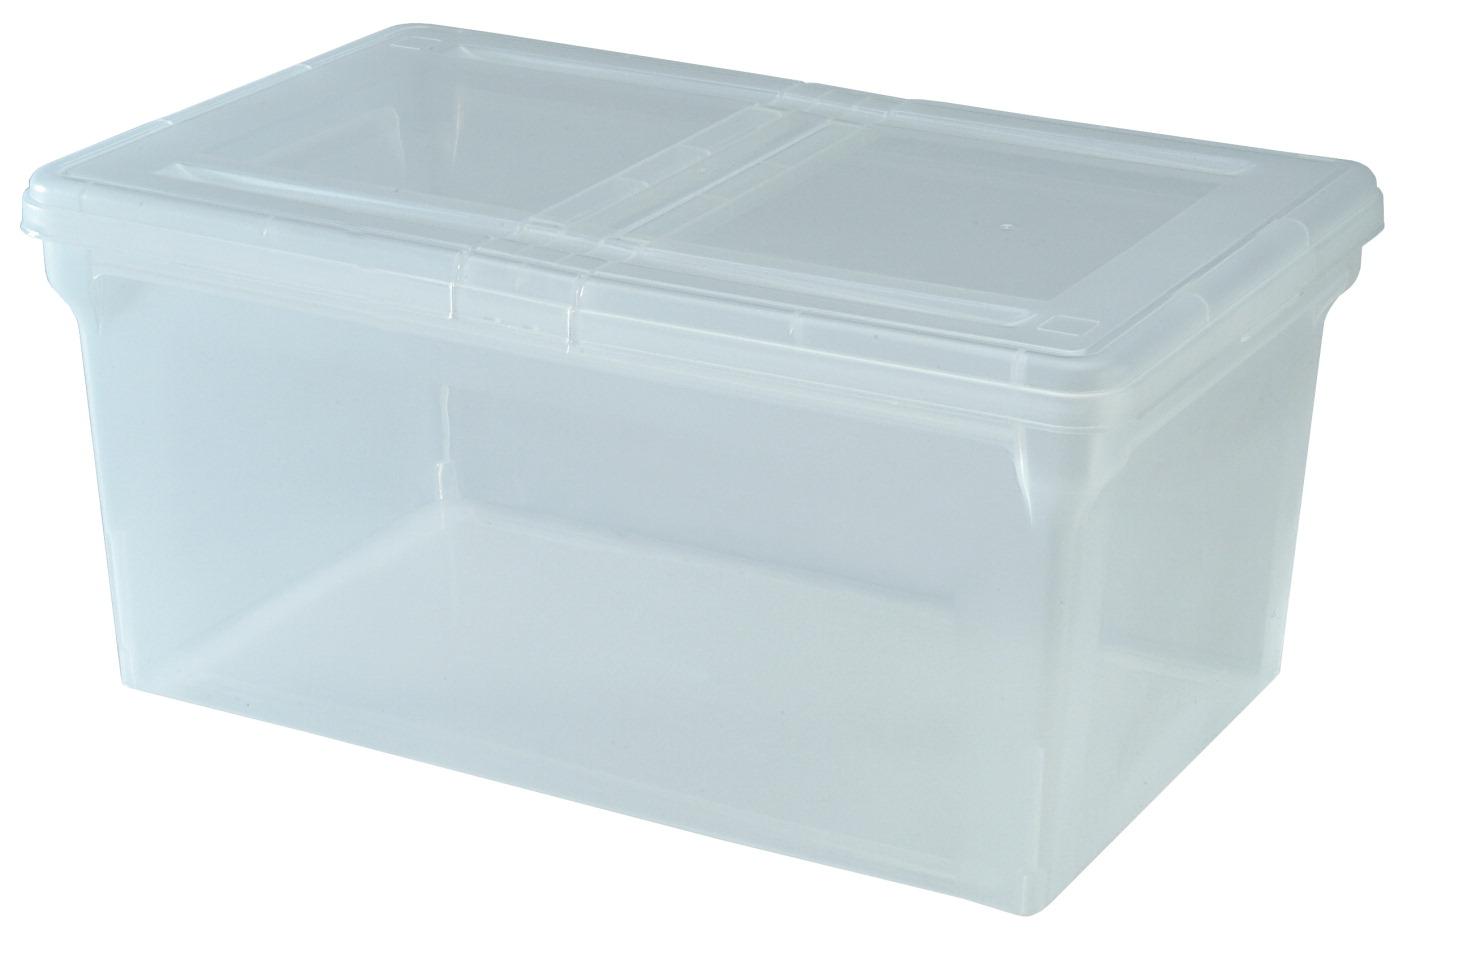 IRIS Letter Size File Box with Split Lid, 10-17/27 x 13-17/27 x 22-3/4  Inches, 44 Quarts